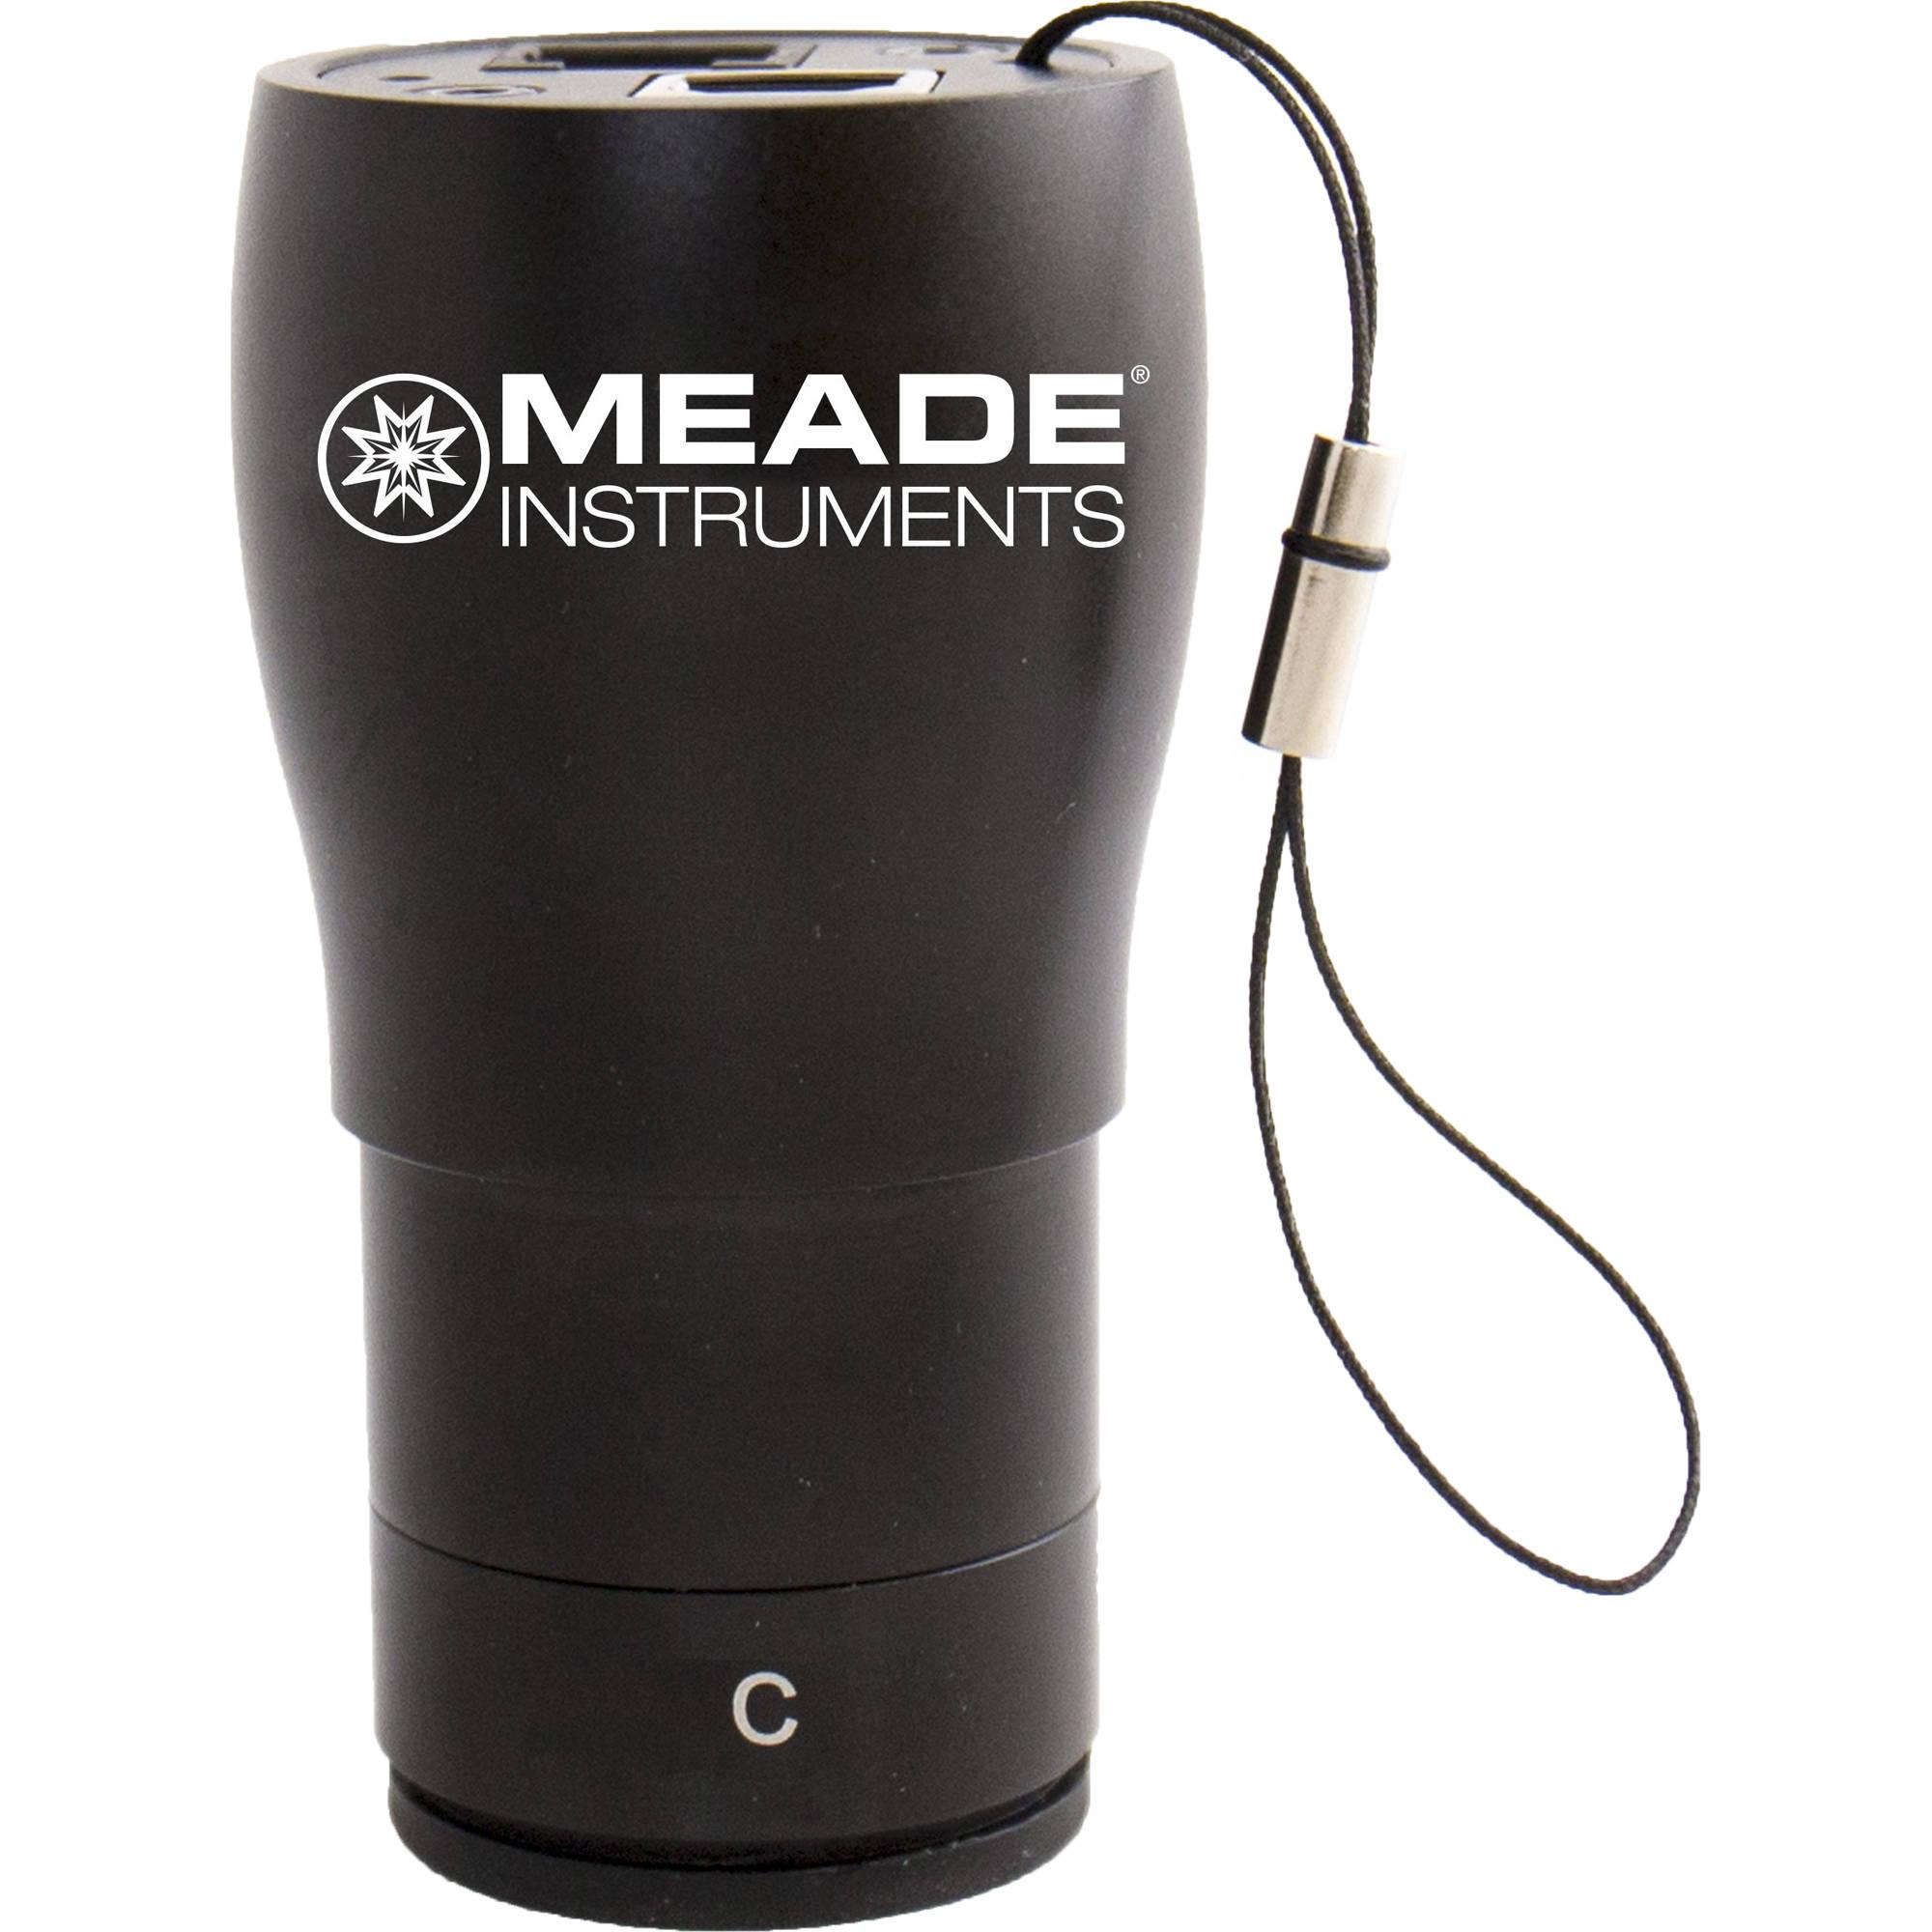 Meade LPI - driver software